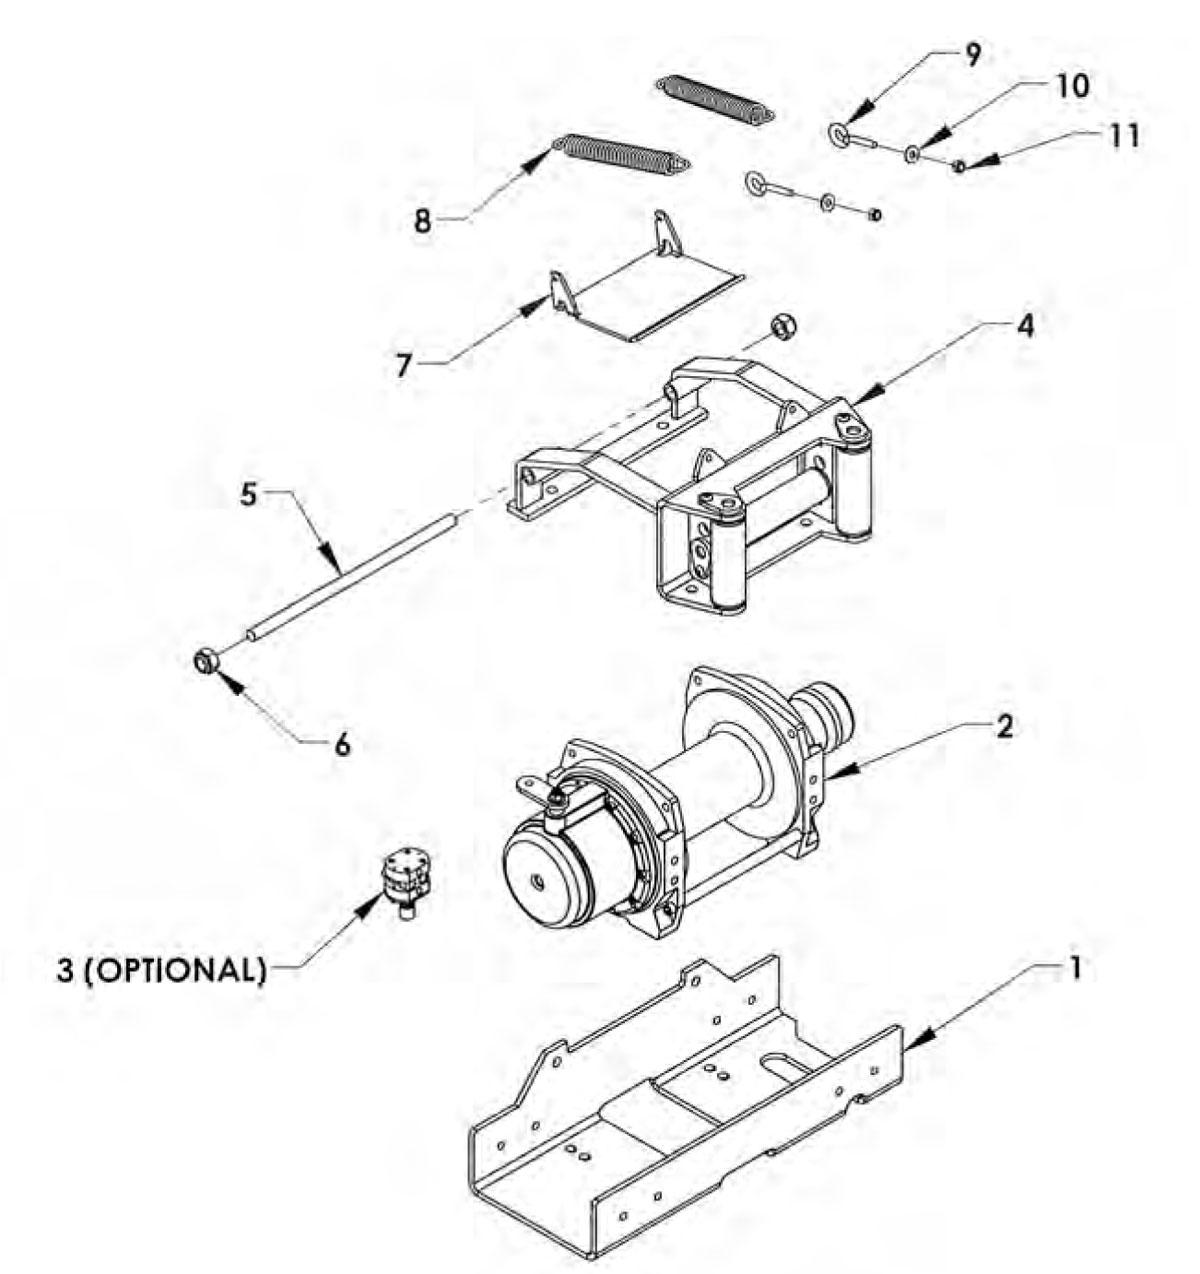 warn winch wiring diagram as well superwinch warn winch